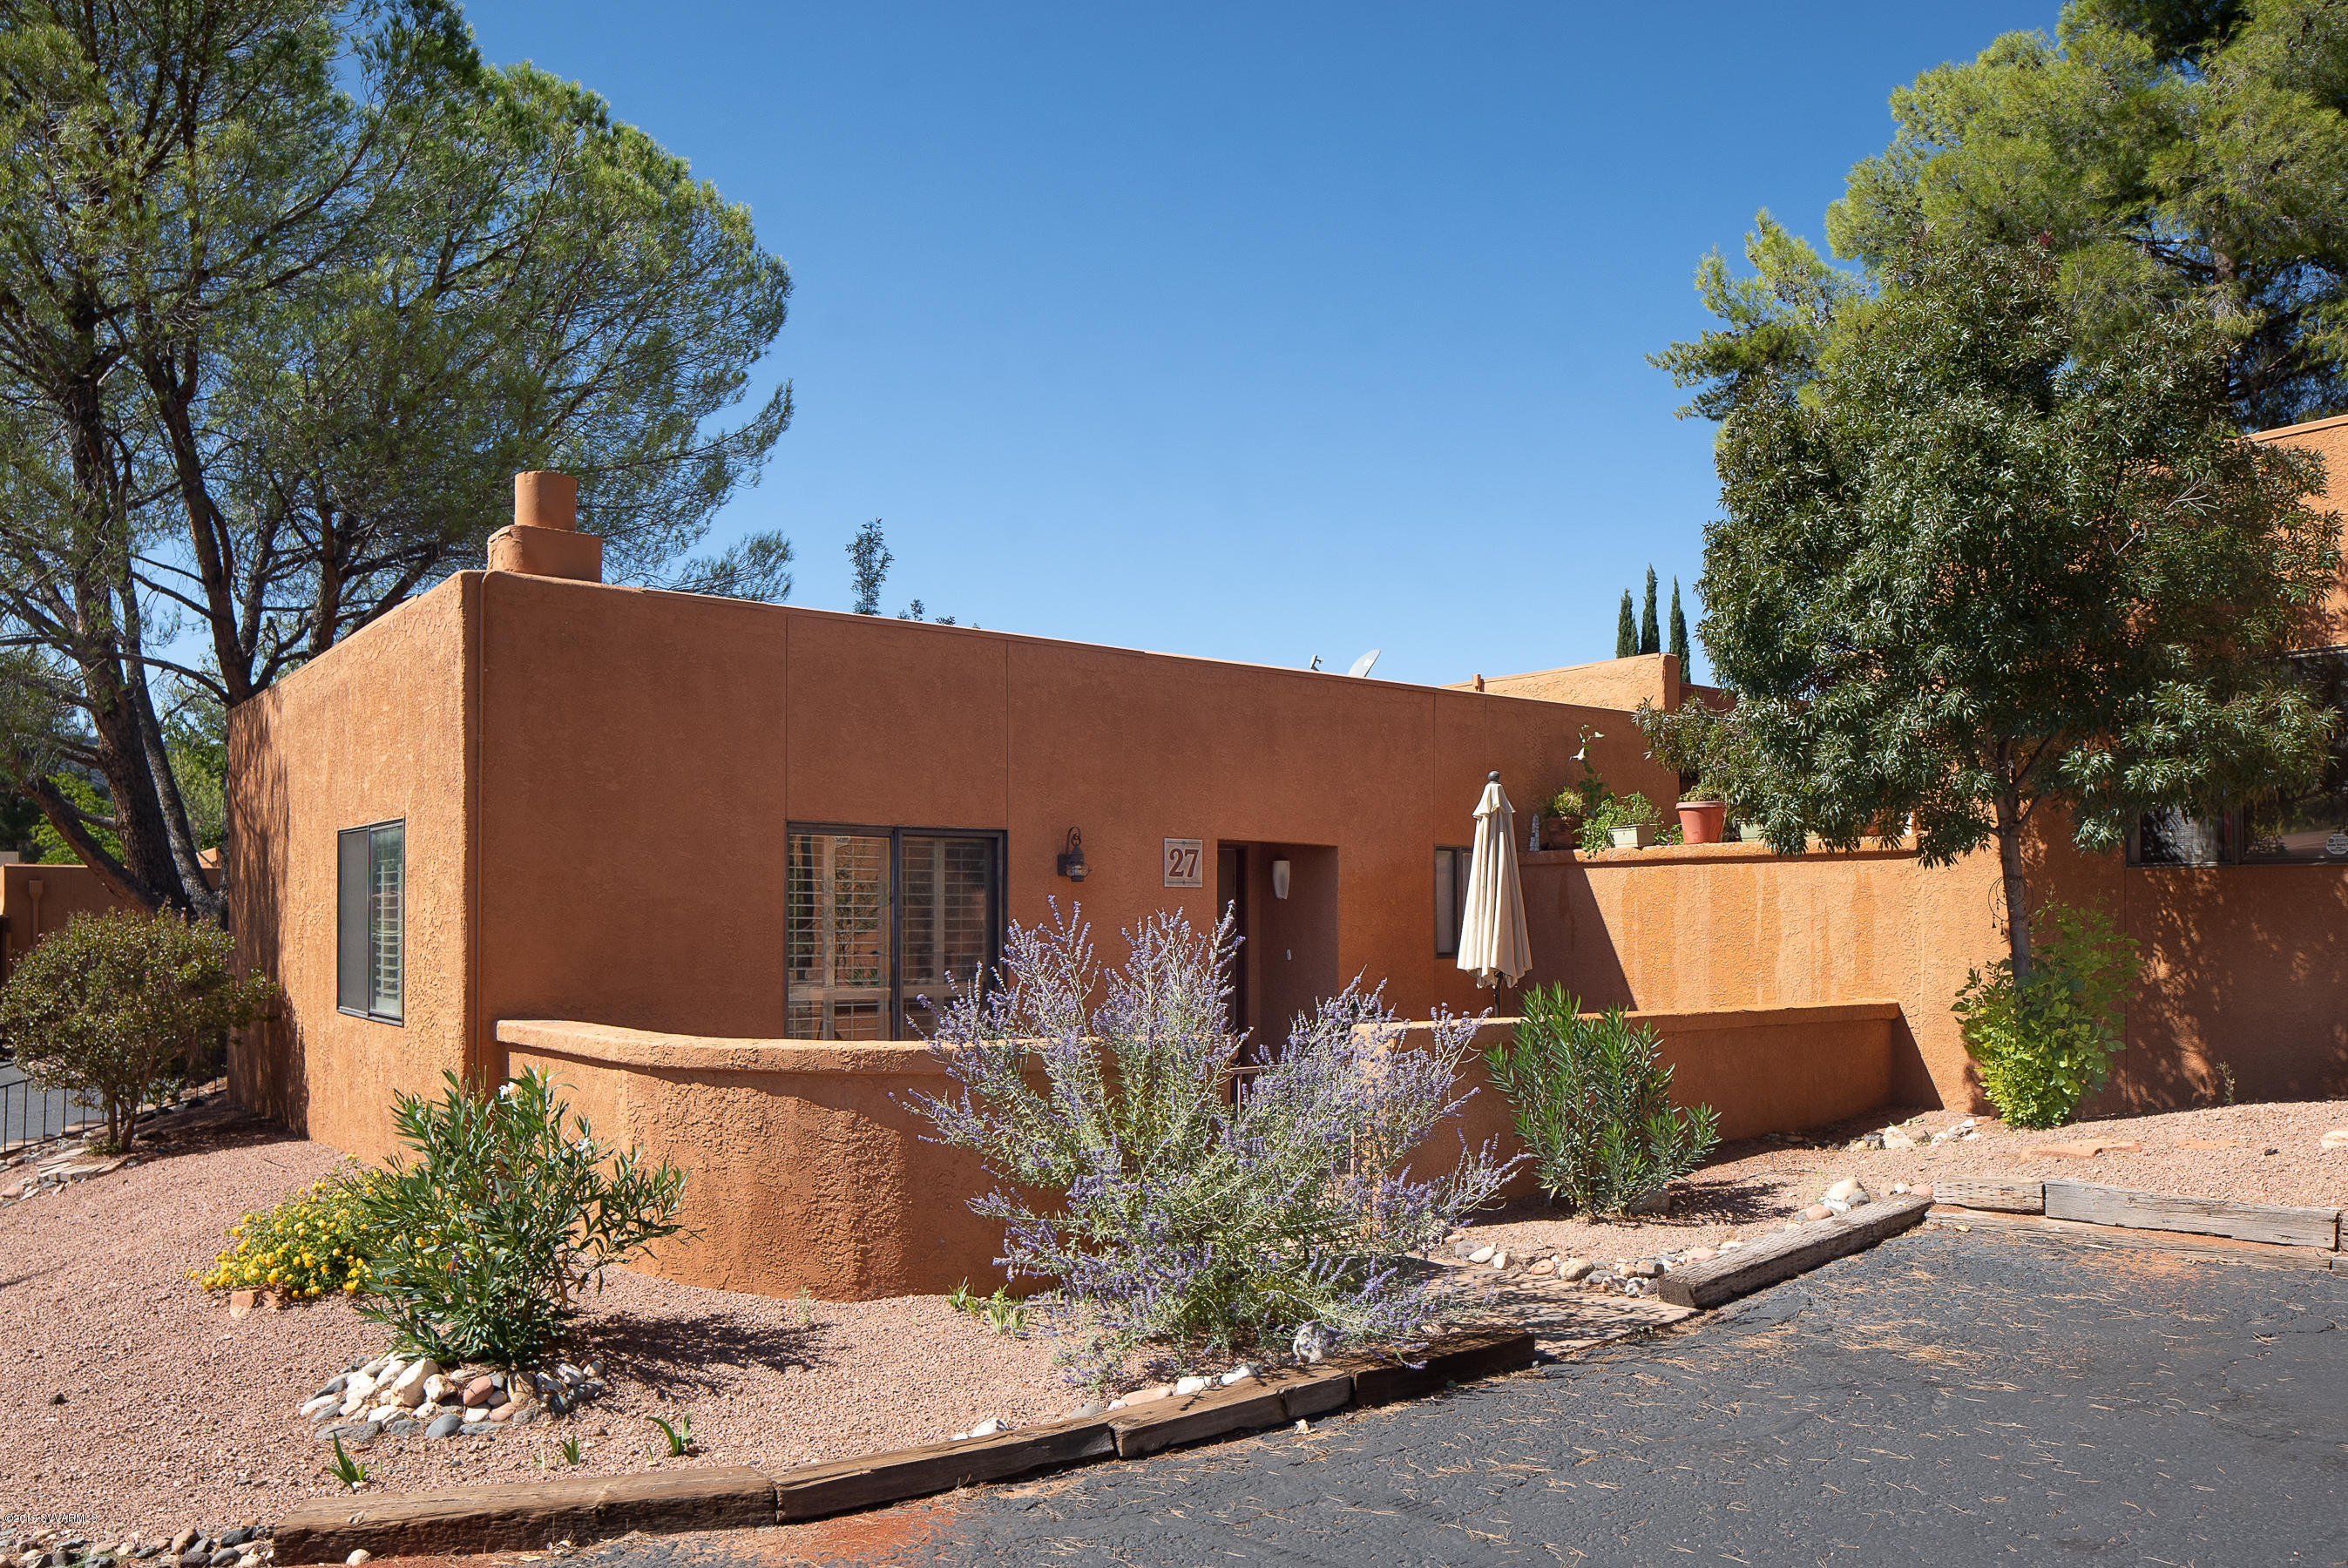 165 Verde Valley School #27 Sedona, AZ 86351